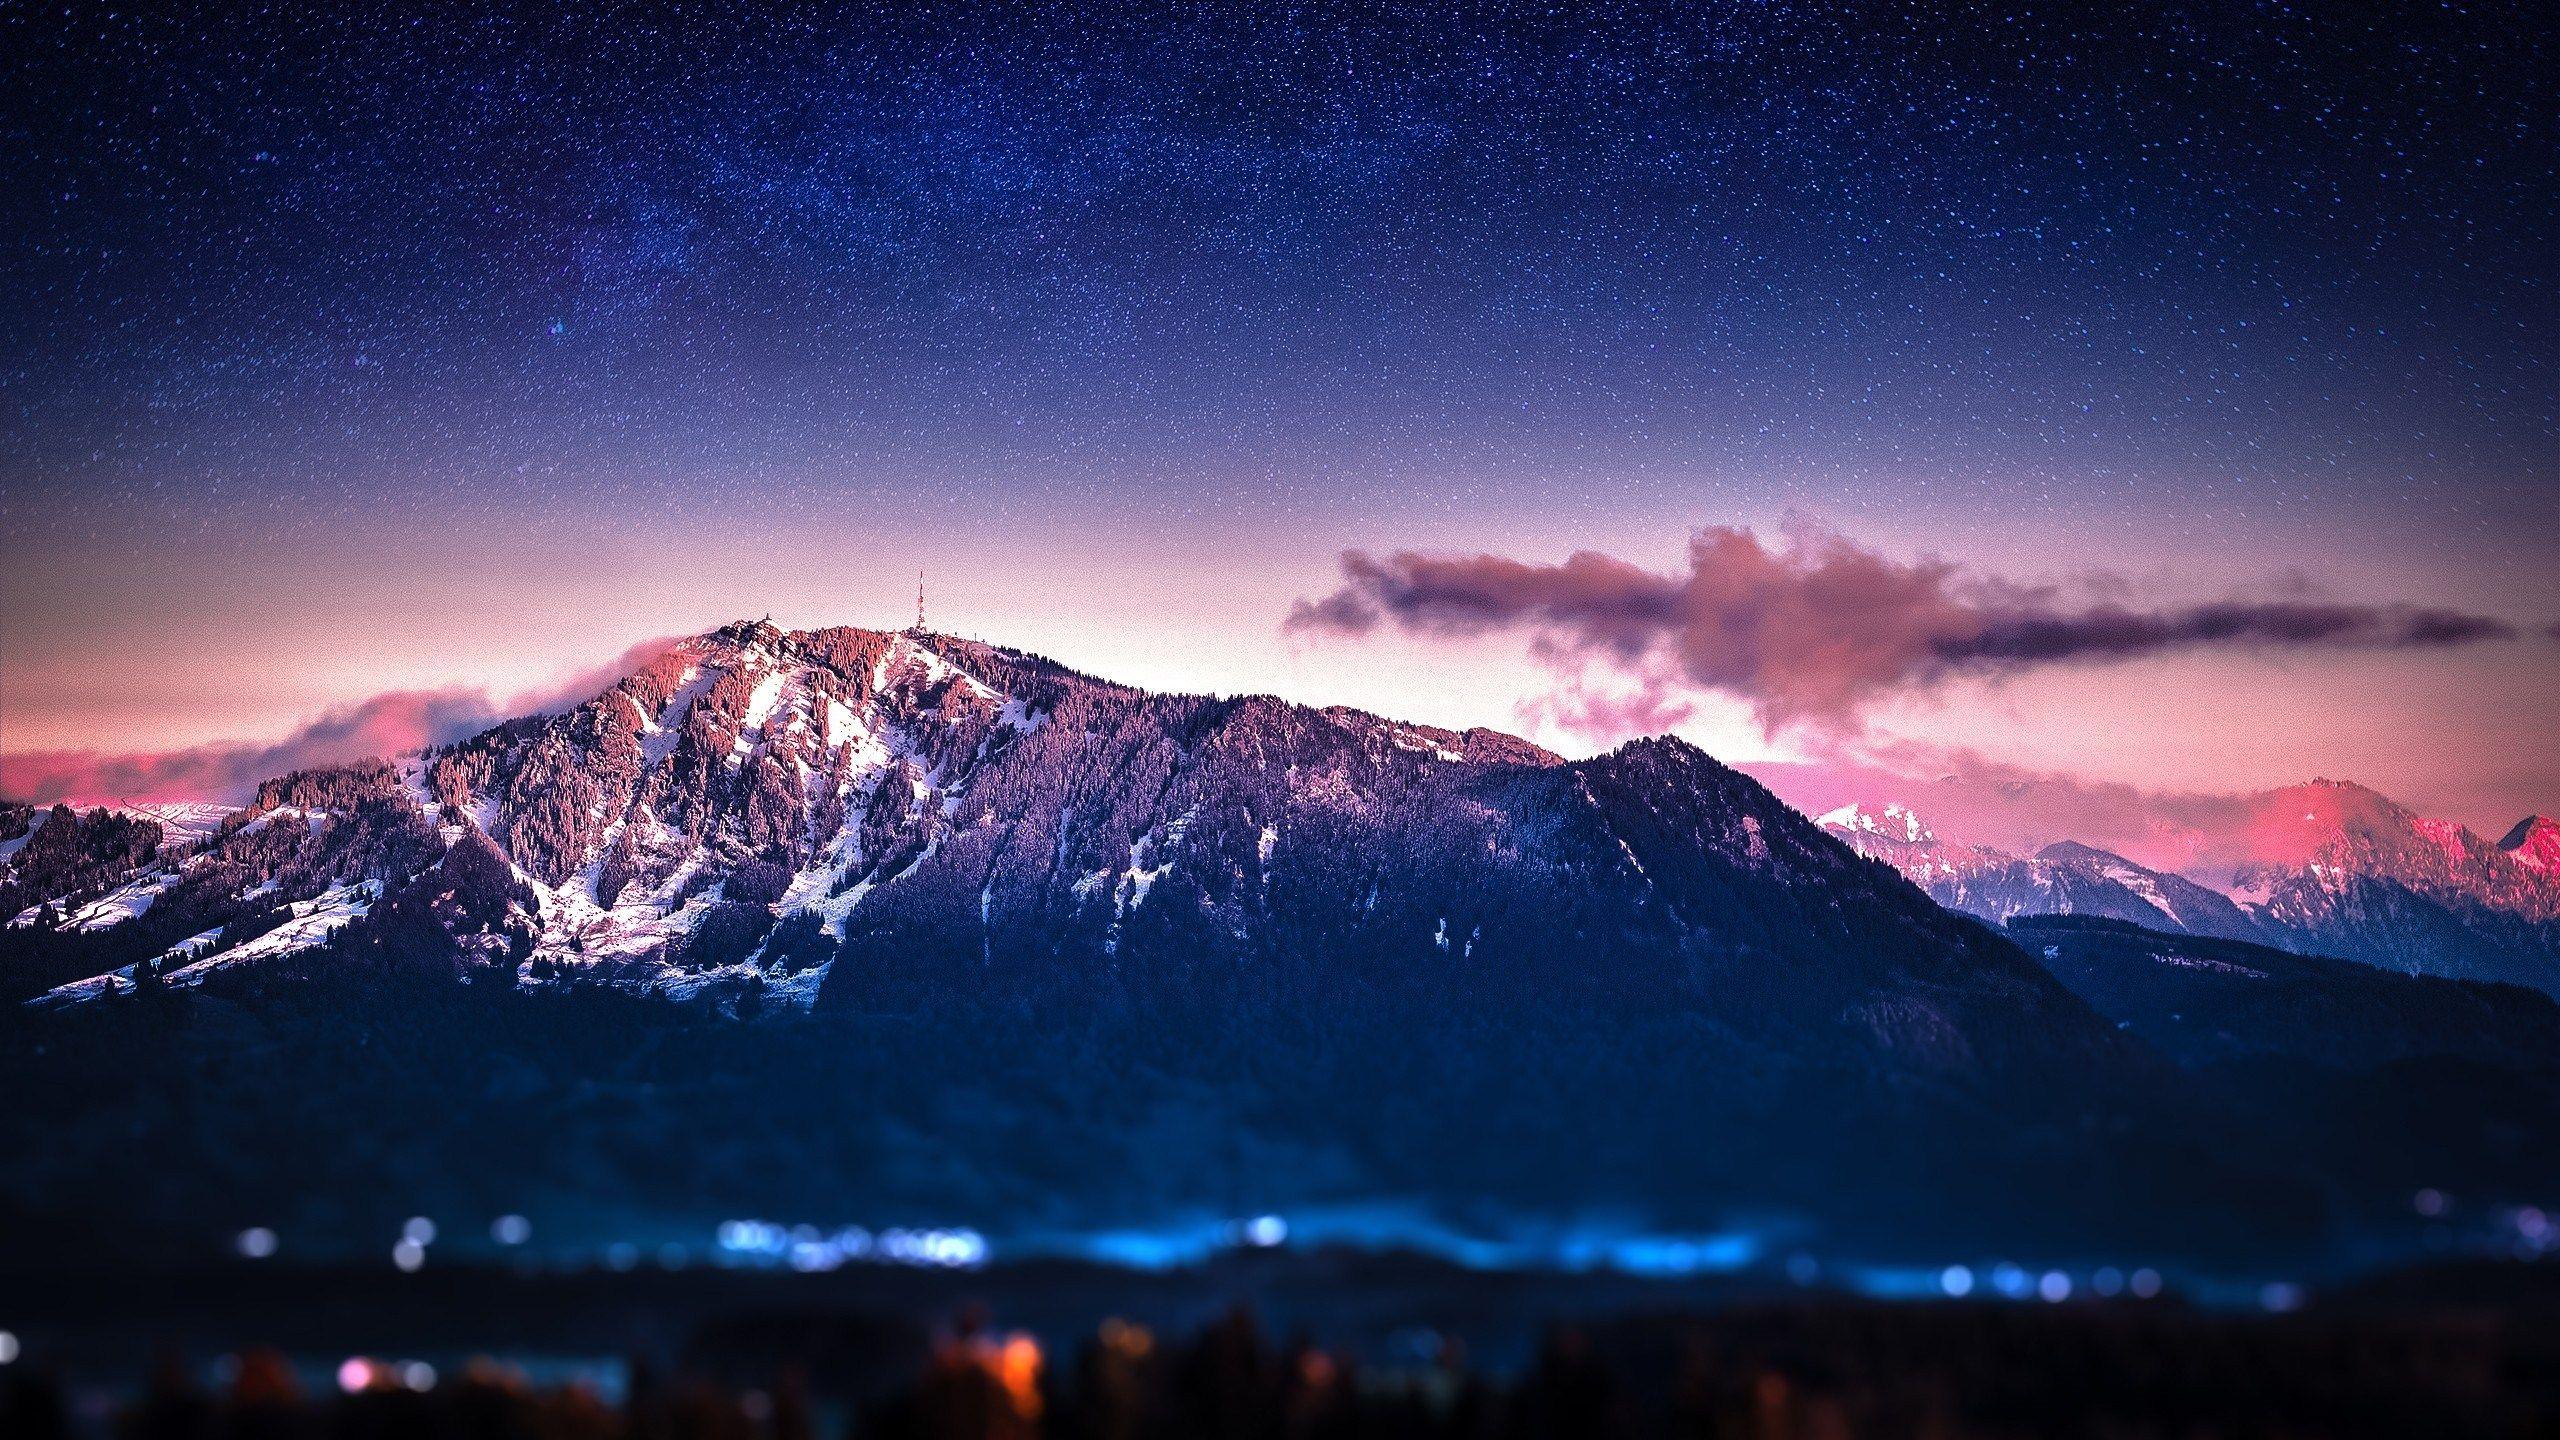 2560x1440 Wallpaper Images Mountain Space Art Mountain Wallpaper Night Landscape